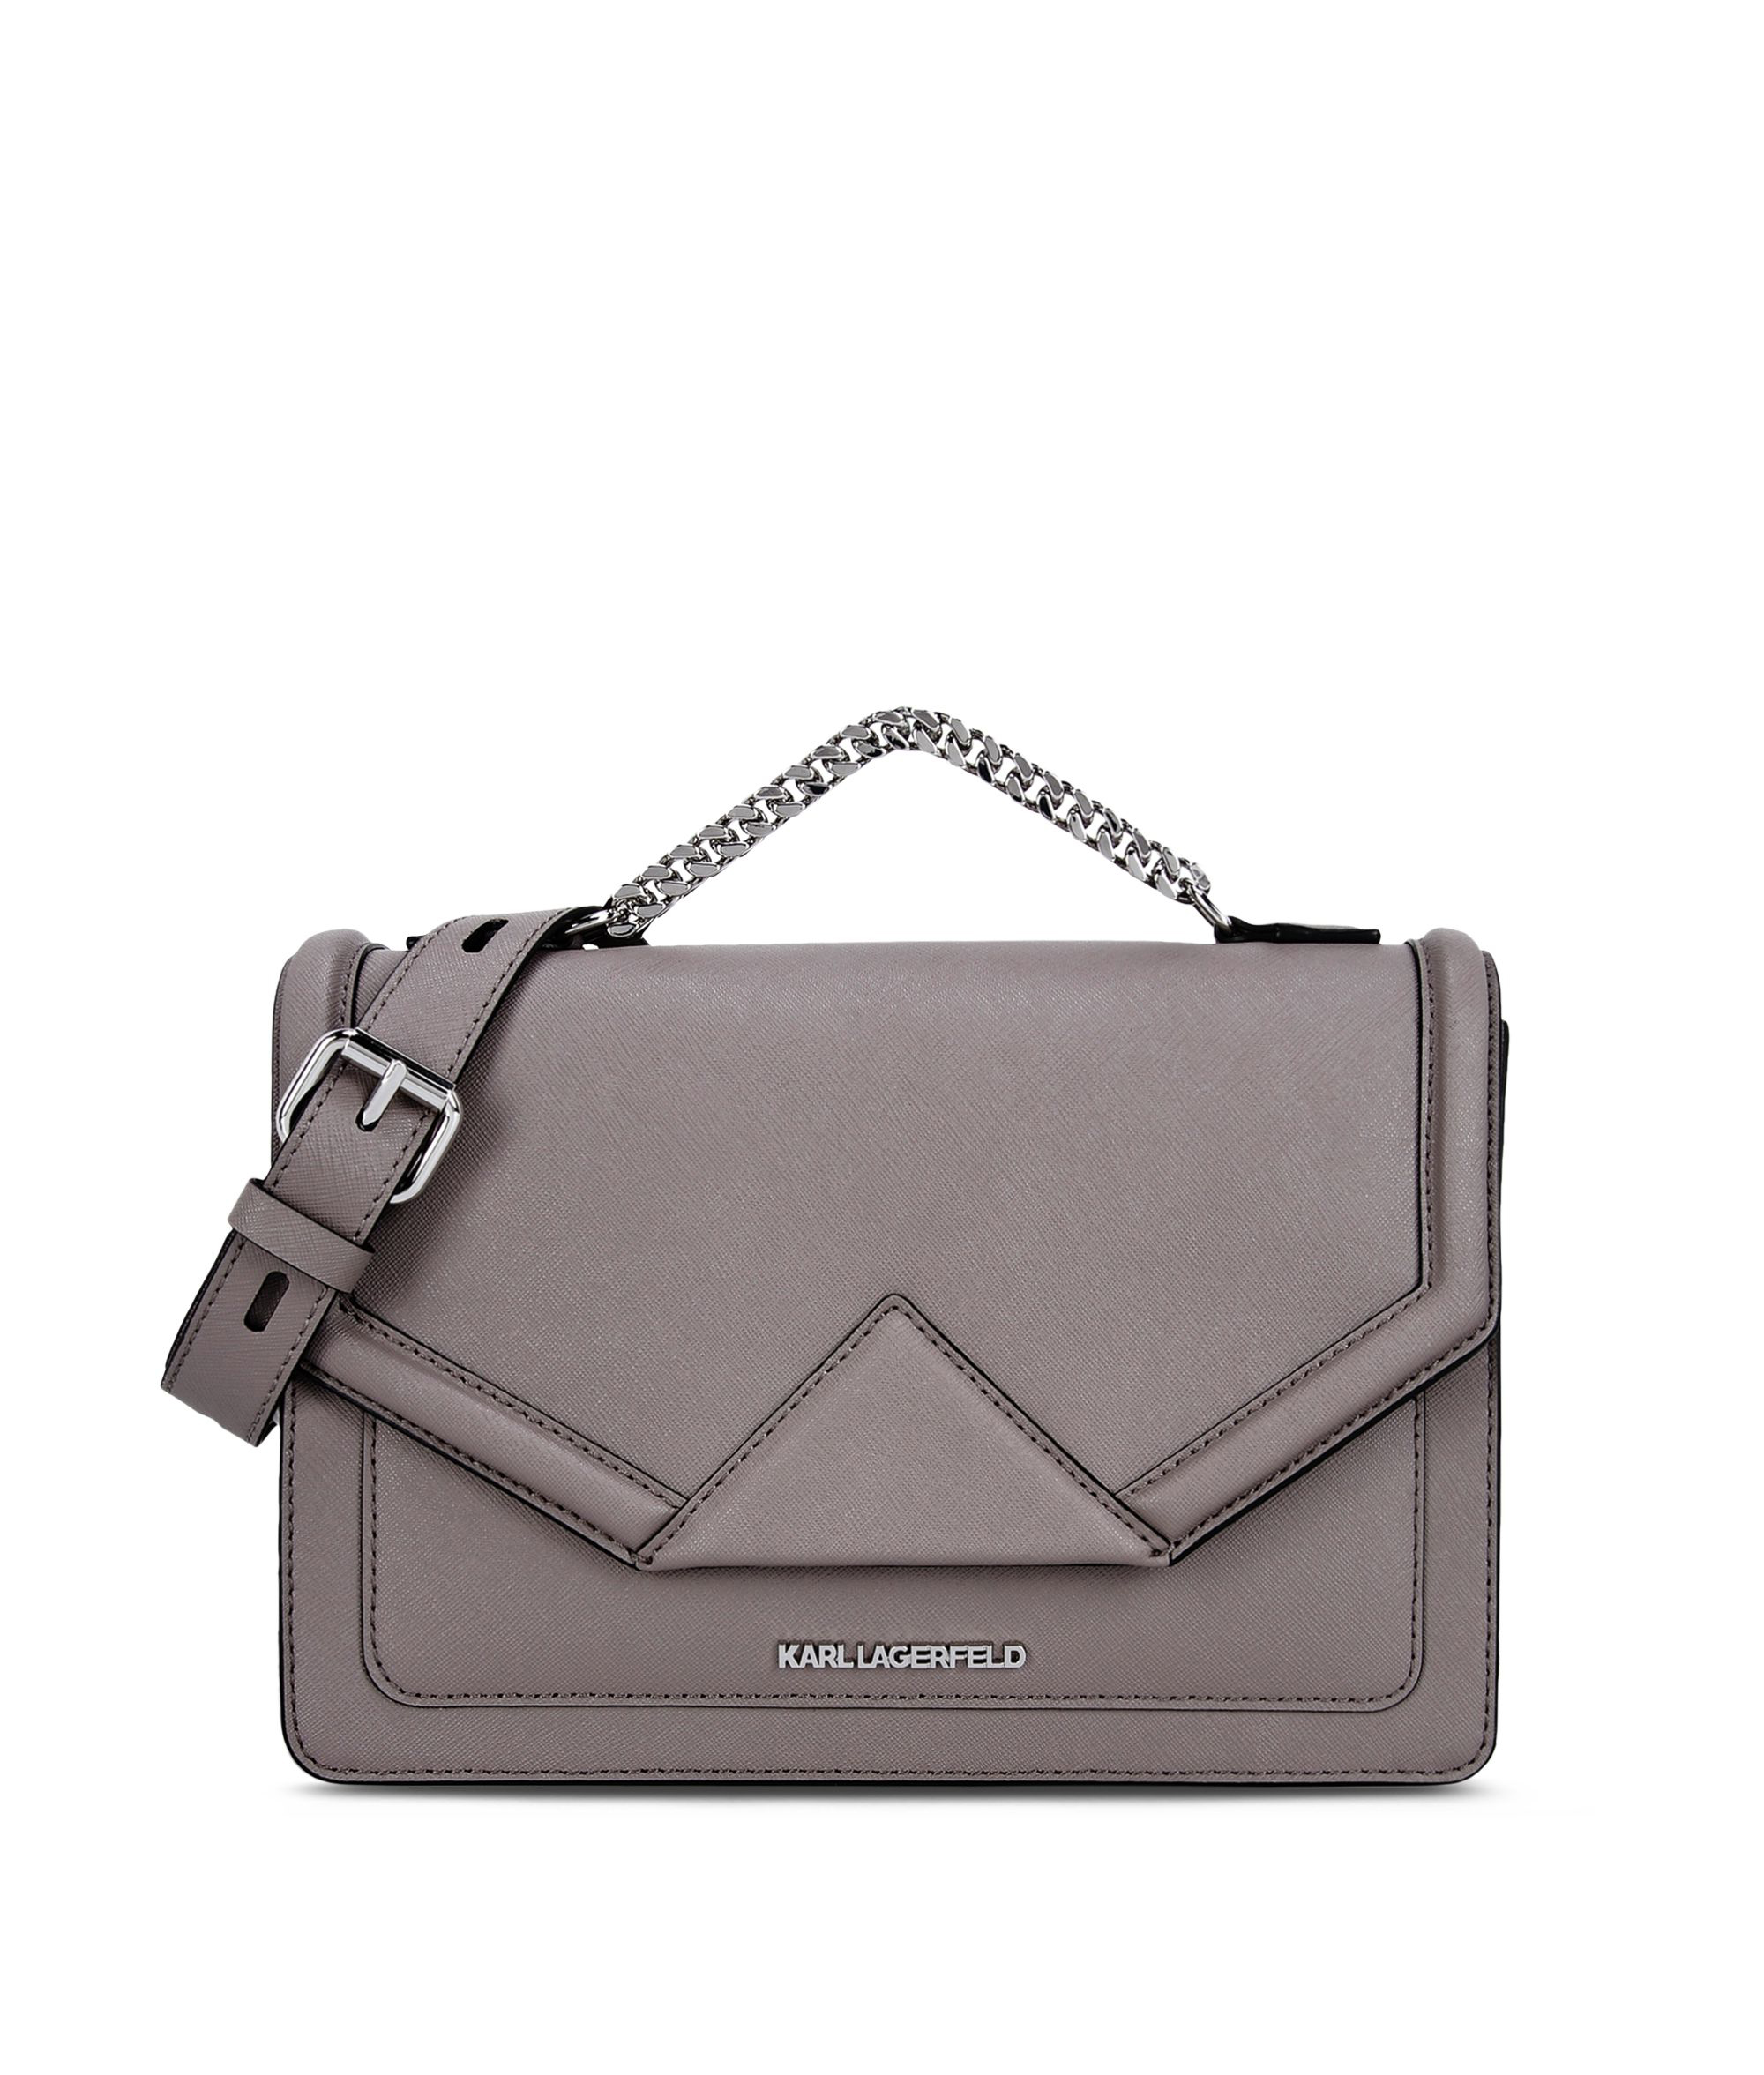 K Klassik Shoulderbag Beige 66KW3002 Karl Lagerfeld accessories: Uvod u uzbudljivu XYZ modnu jesen